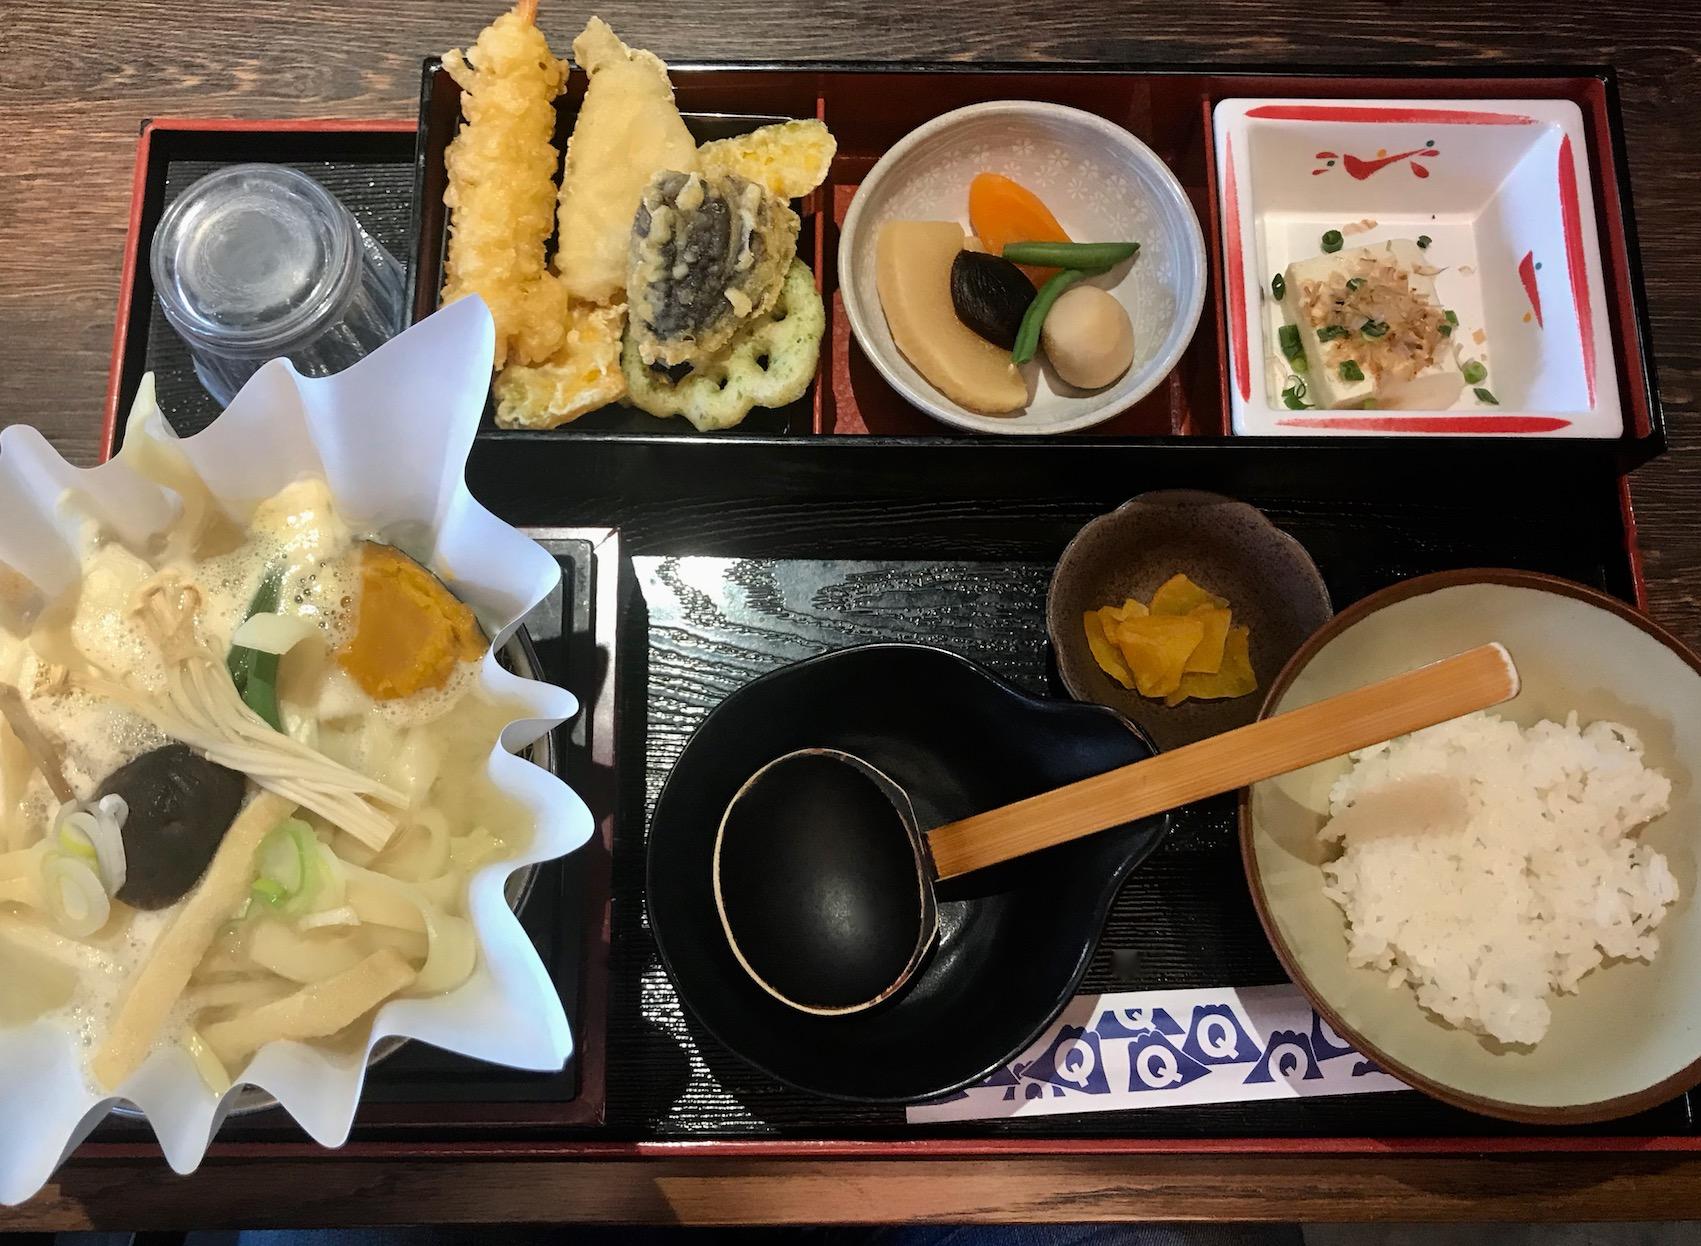 Lunch at Fuji-Q Highland Amusement Park Mount Fuji Japan.